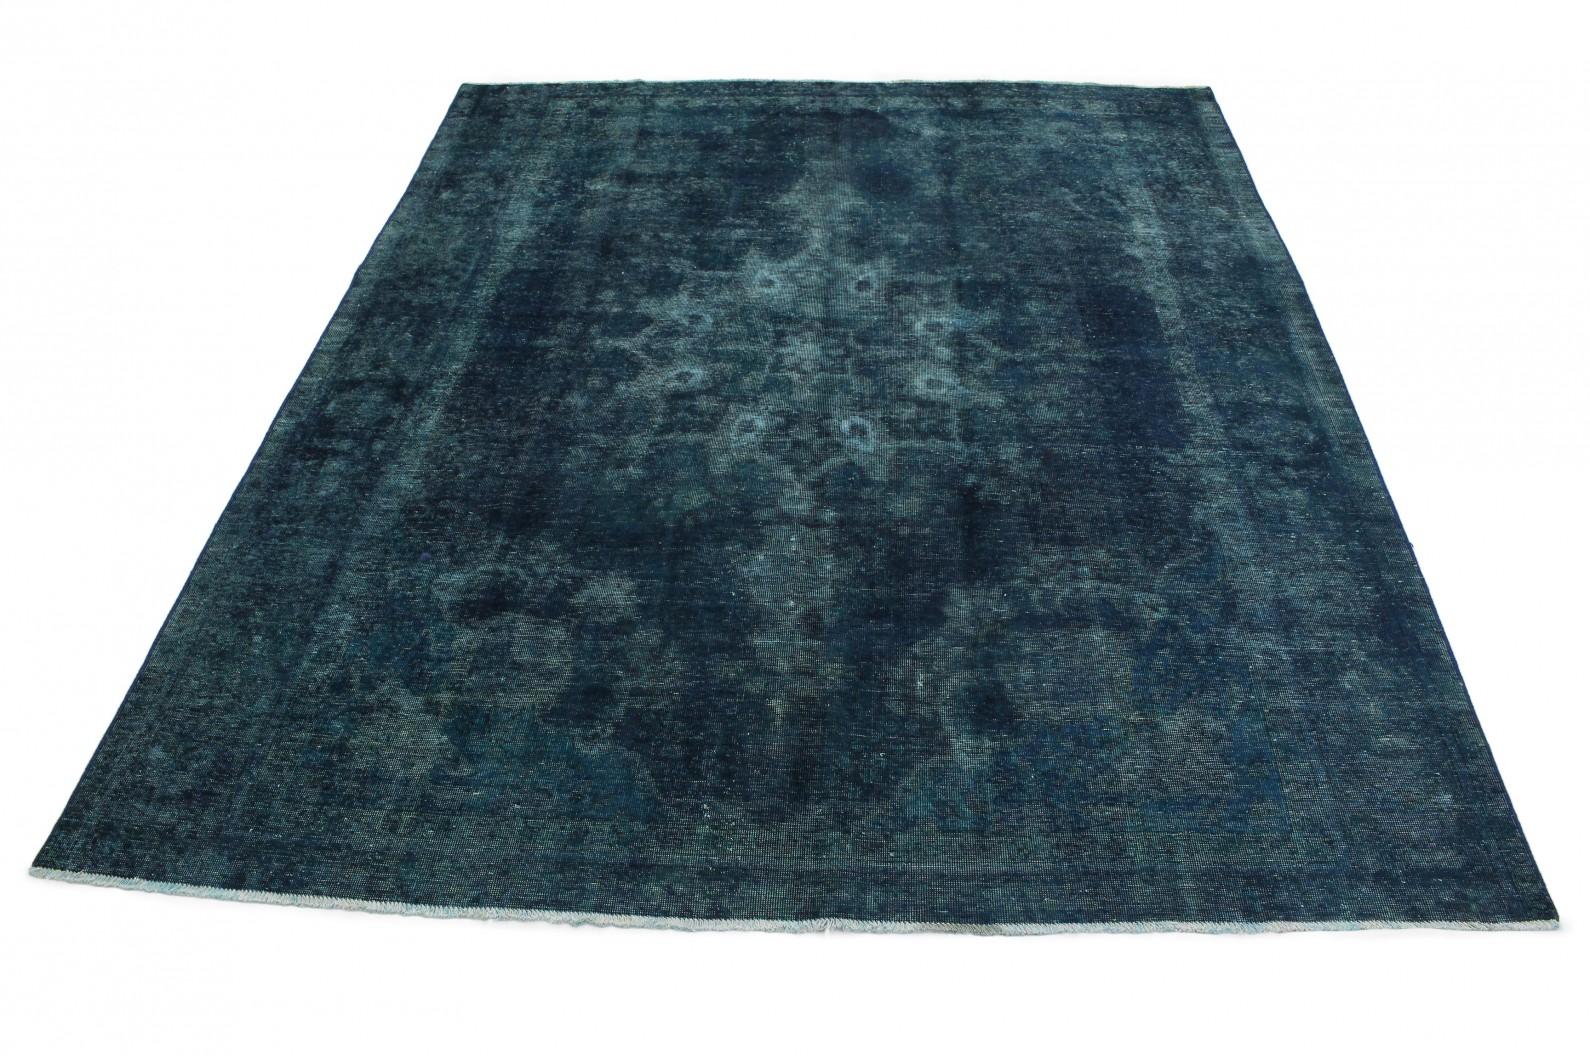 vintage teppich blau petrol in 370x300cm 1001 2728 bei. Black Bedroom Furniture Sets. Home Design Ideas